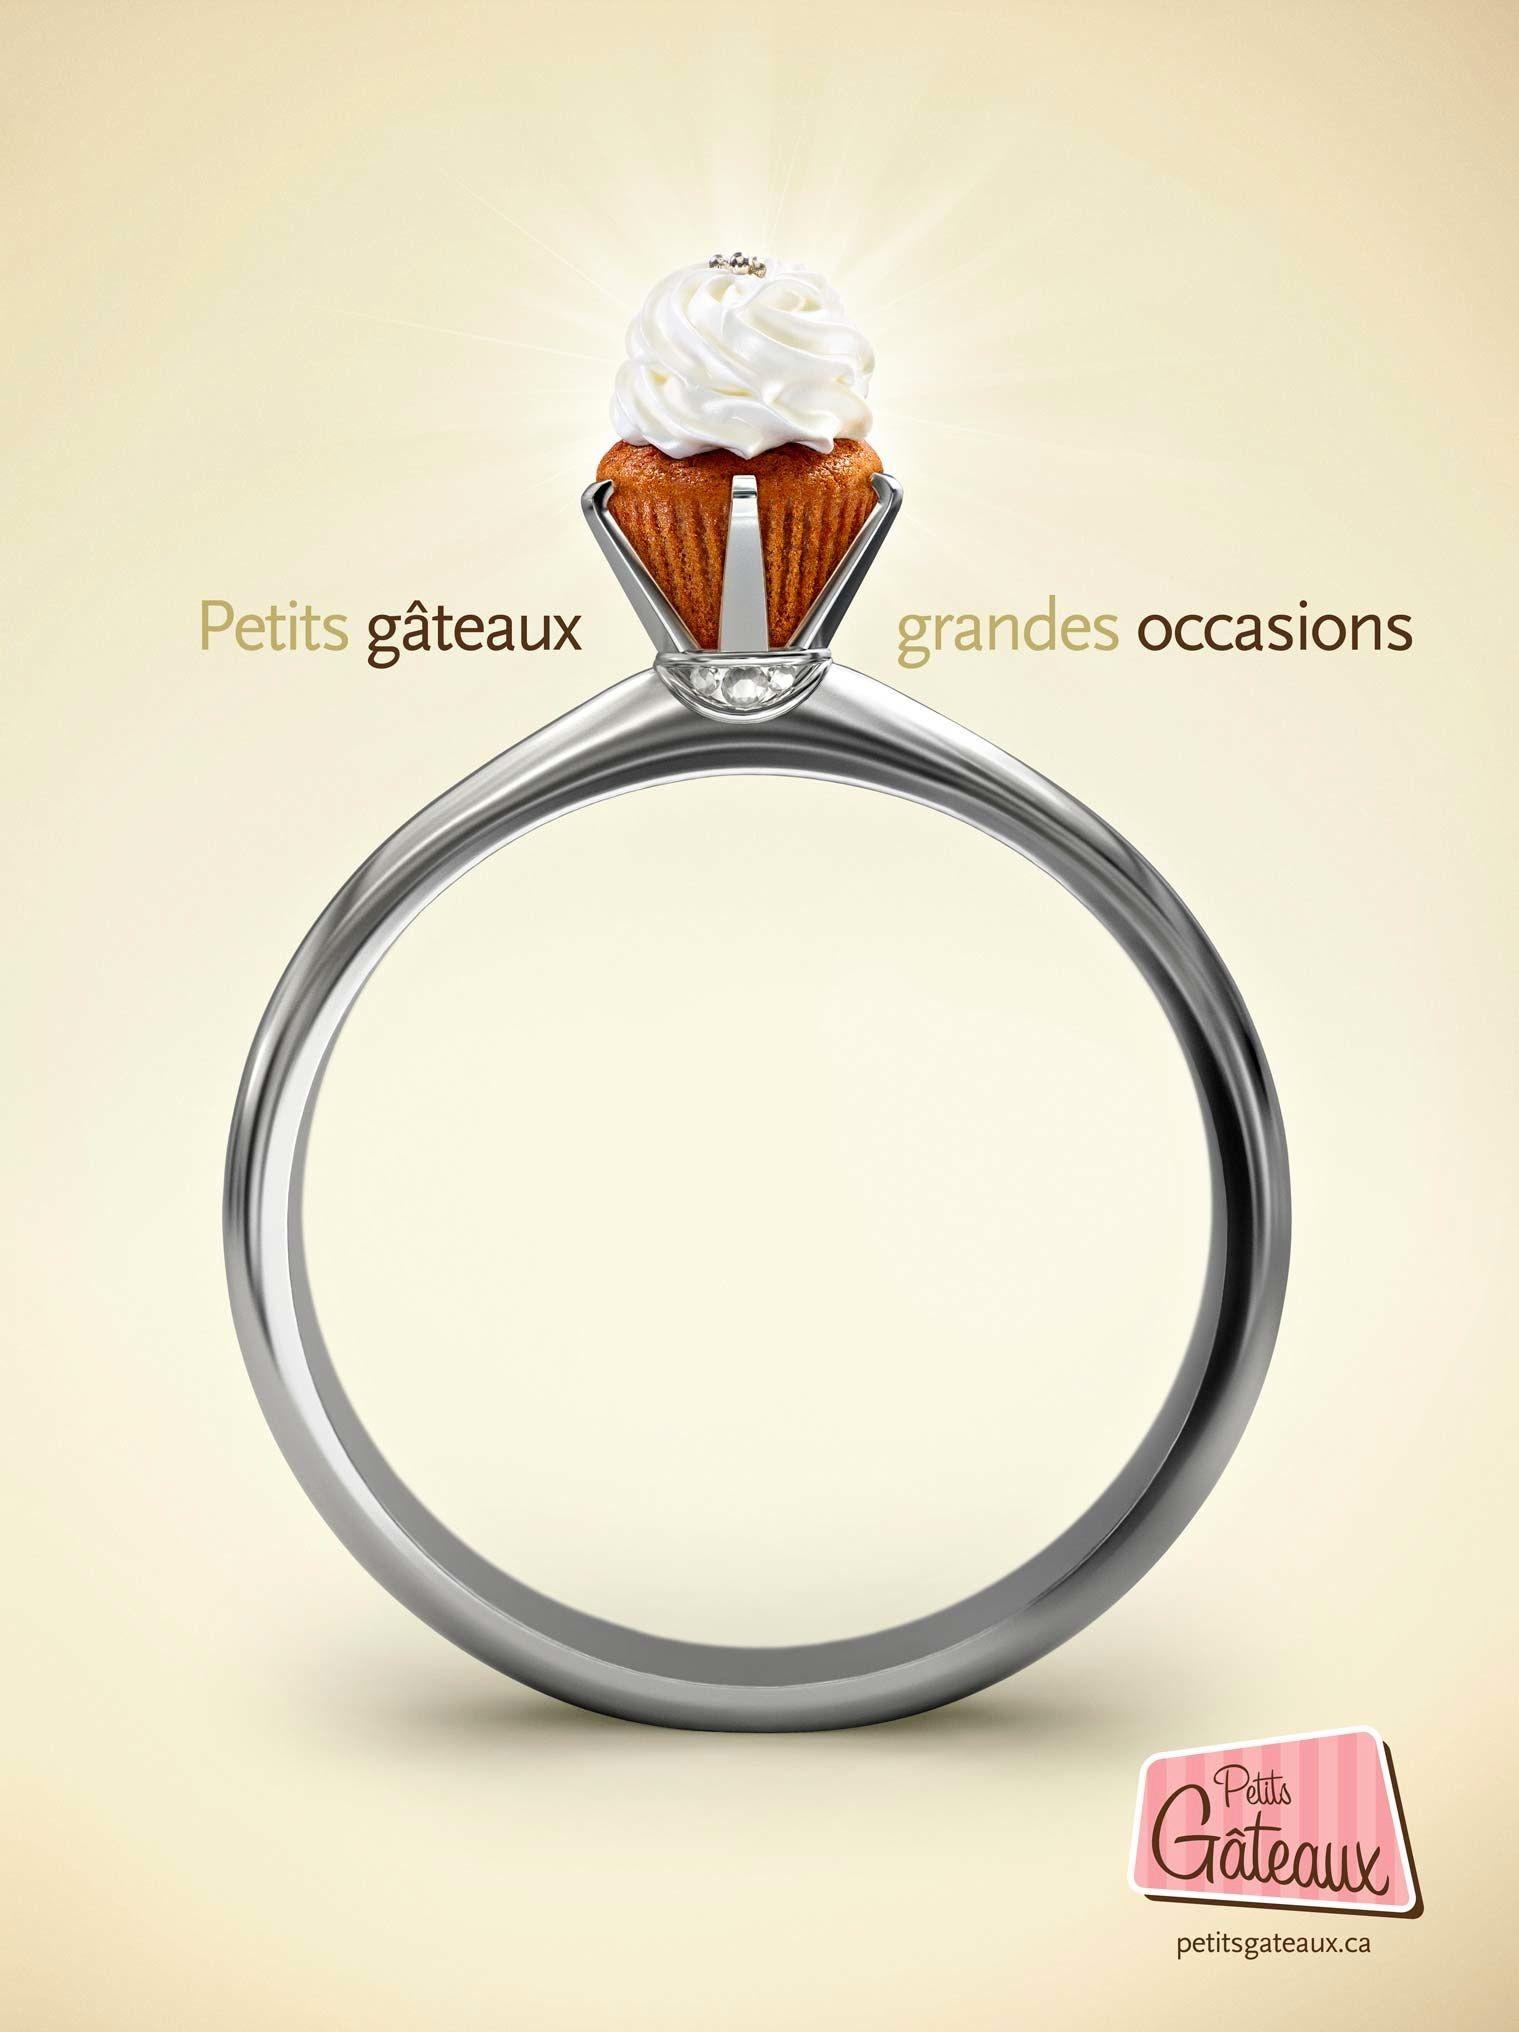 Creative Advertising Ads Man Pinterest Hilo Platinum Swiss Chocolate Campaign Cupcakes